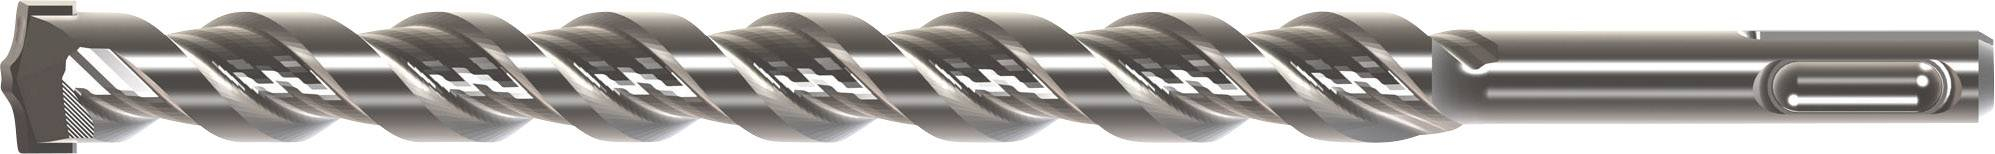 Tvrdý kov kladivový vrták Heller 156233, 6 mm, 160 mm, 1 ks